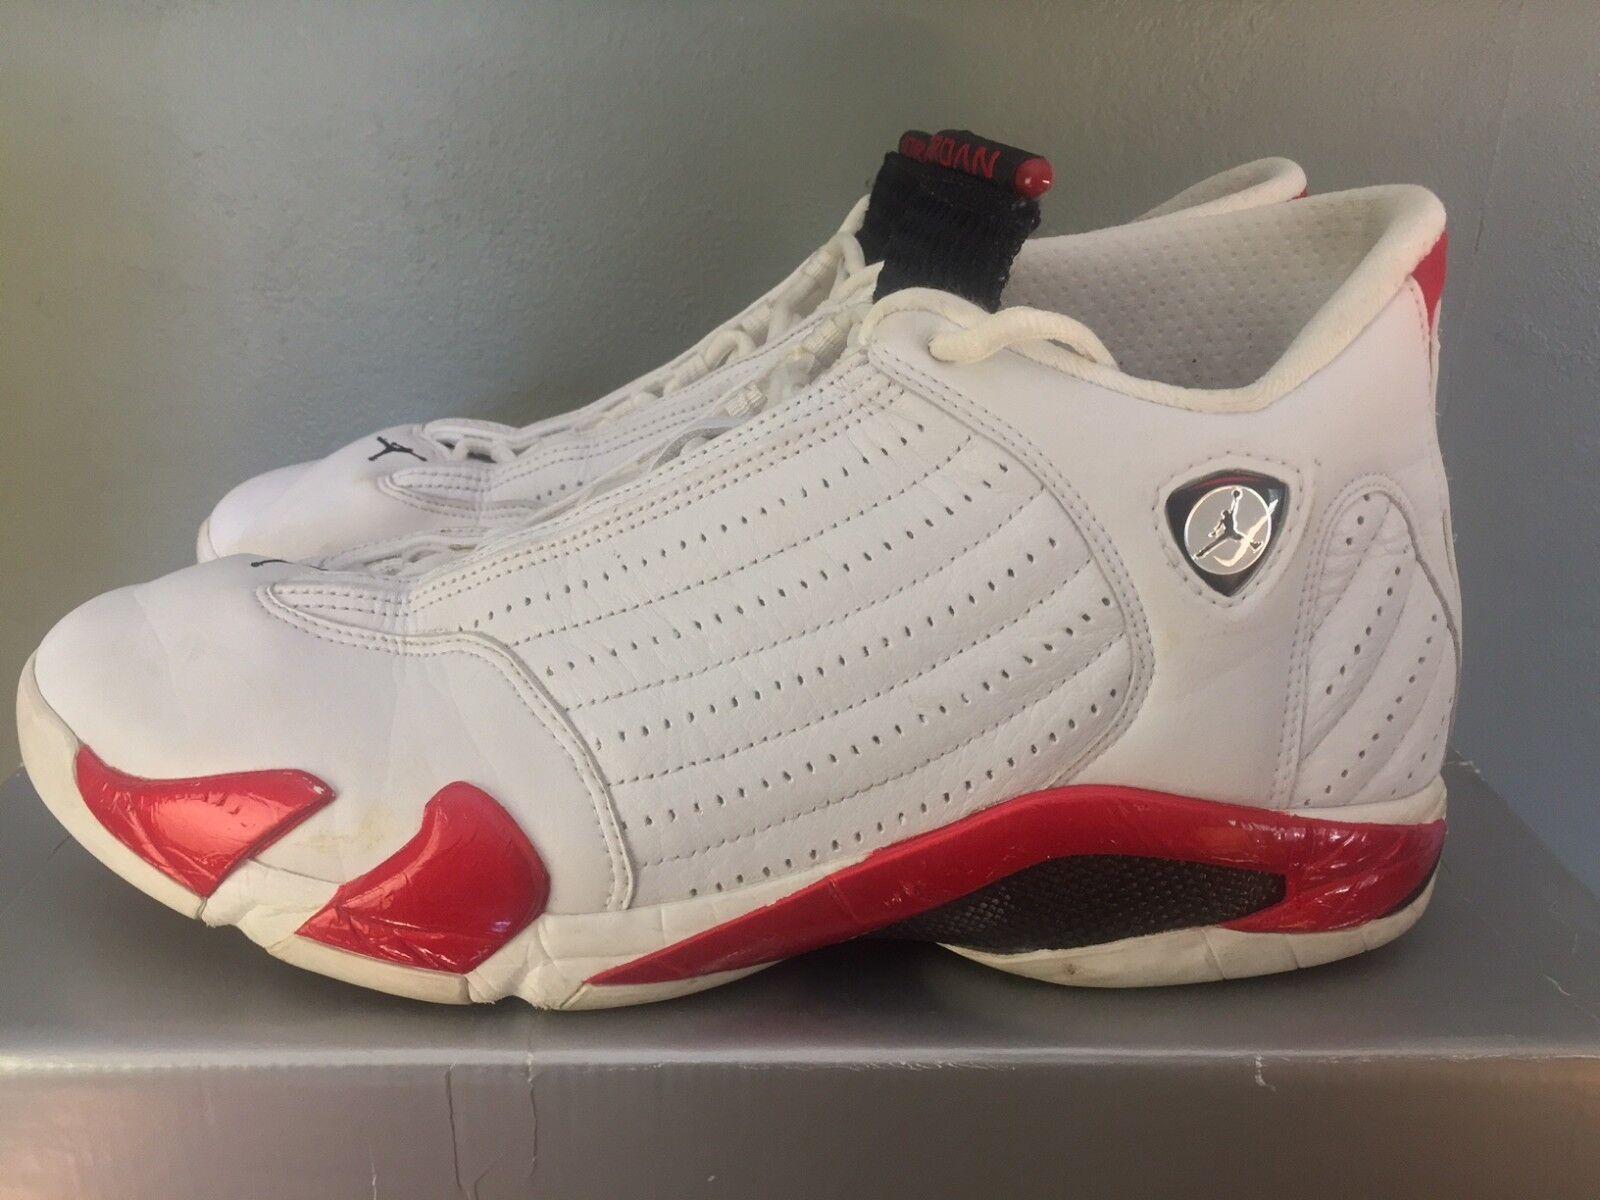 1999 Nike Air Jordan 14 (XIV) Original (OG) 136011 102 Size 13